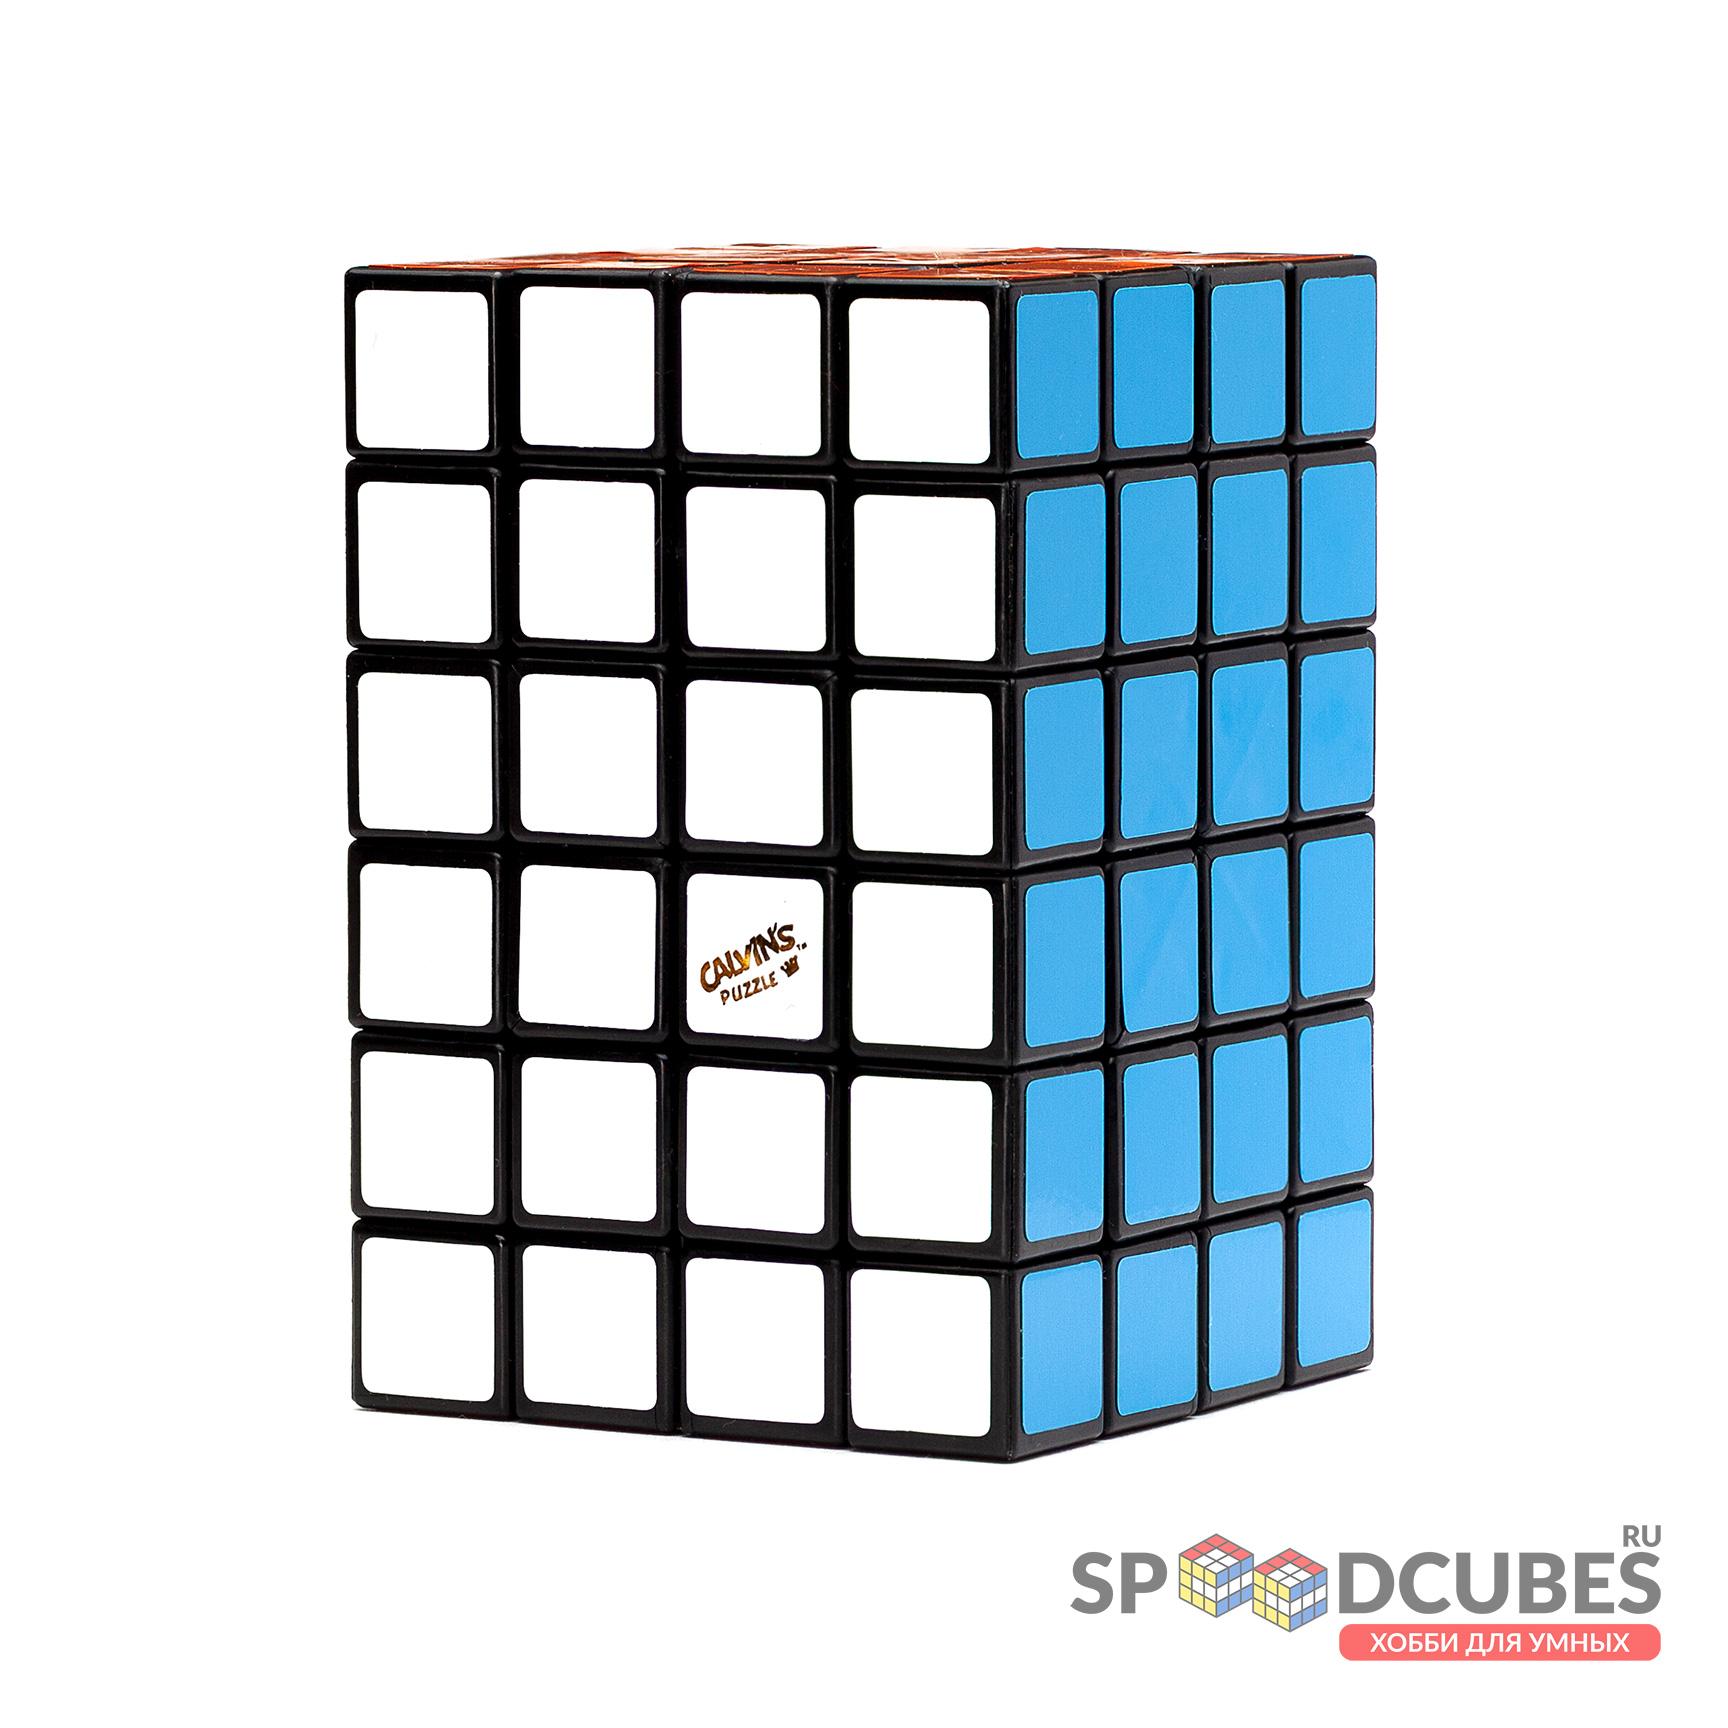 Calvin's 4x4x6 Cuboid